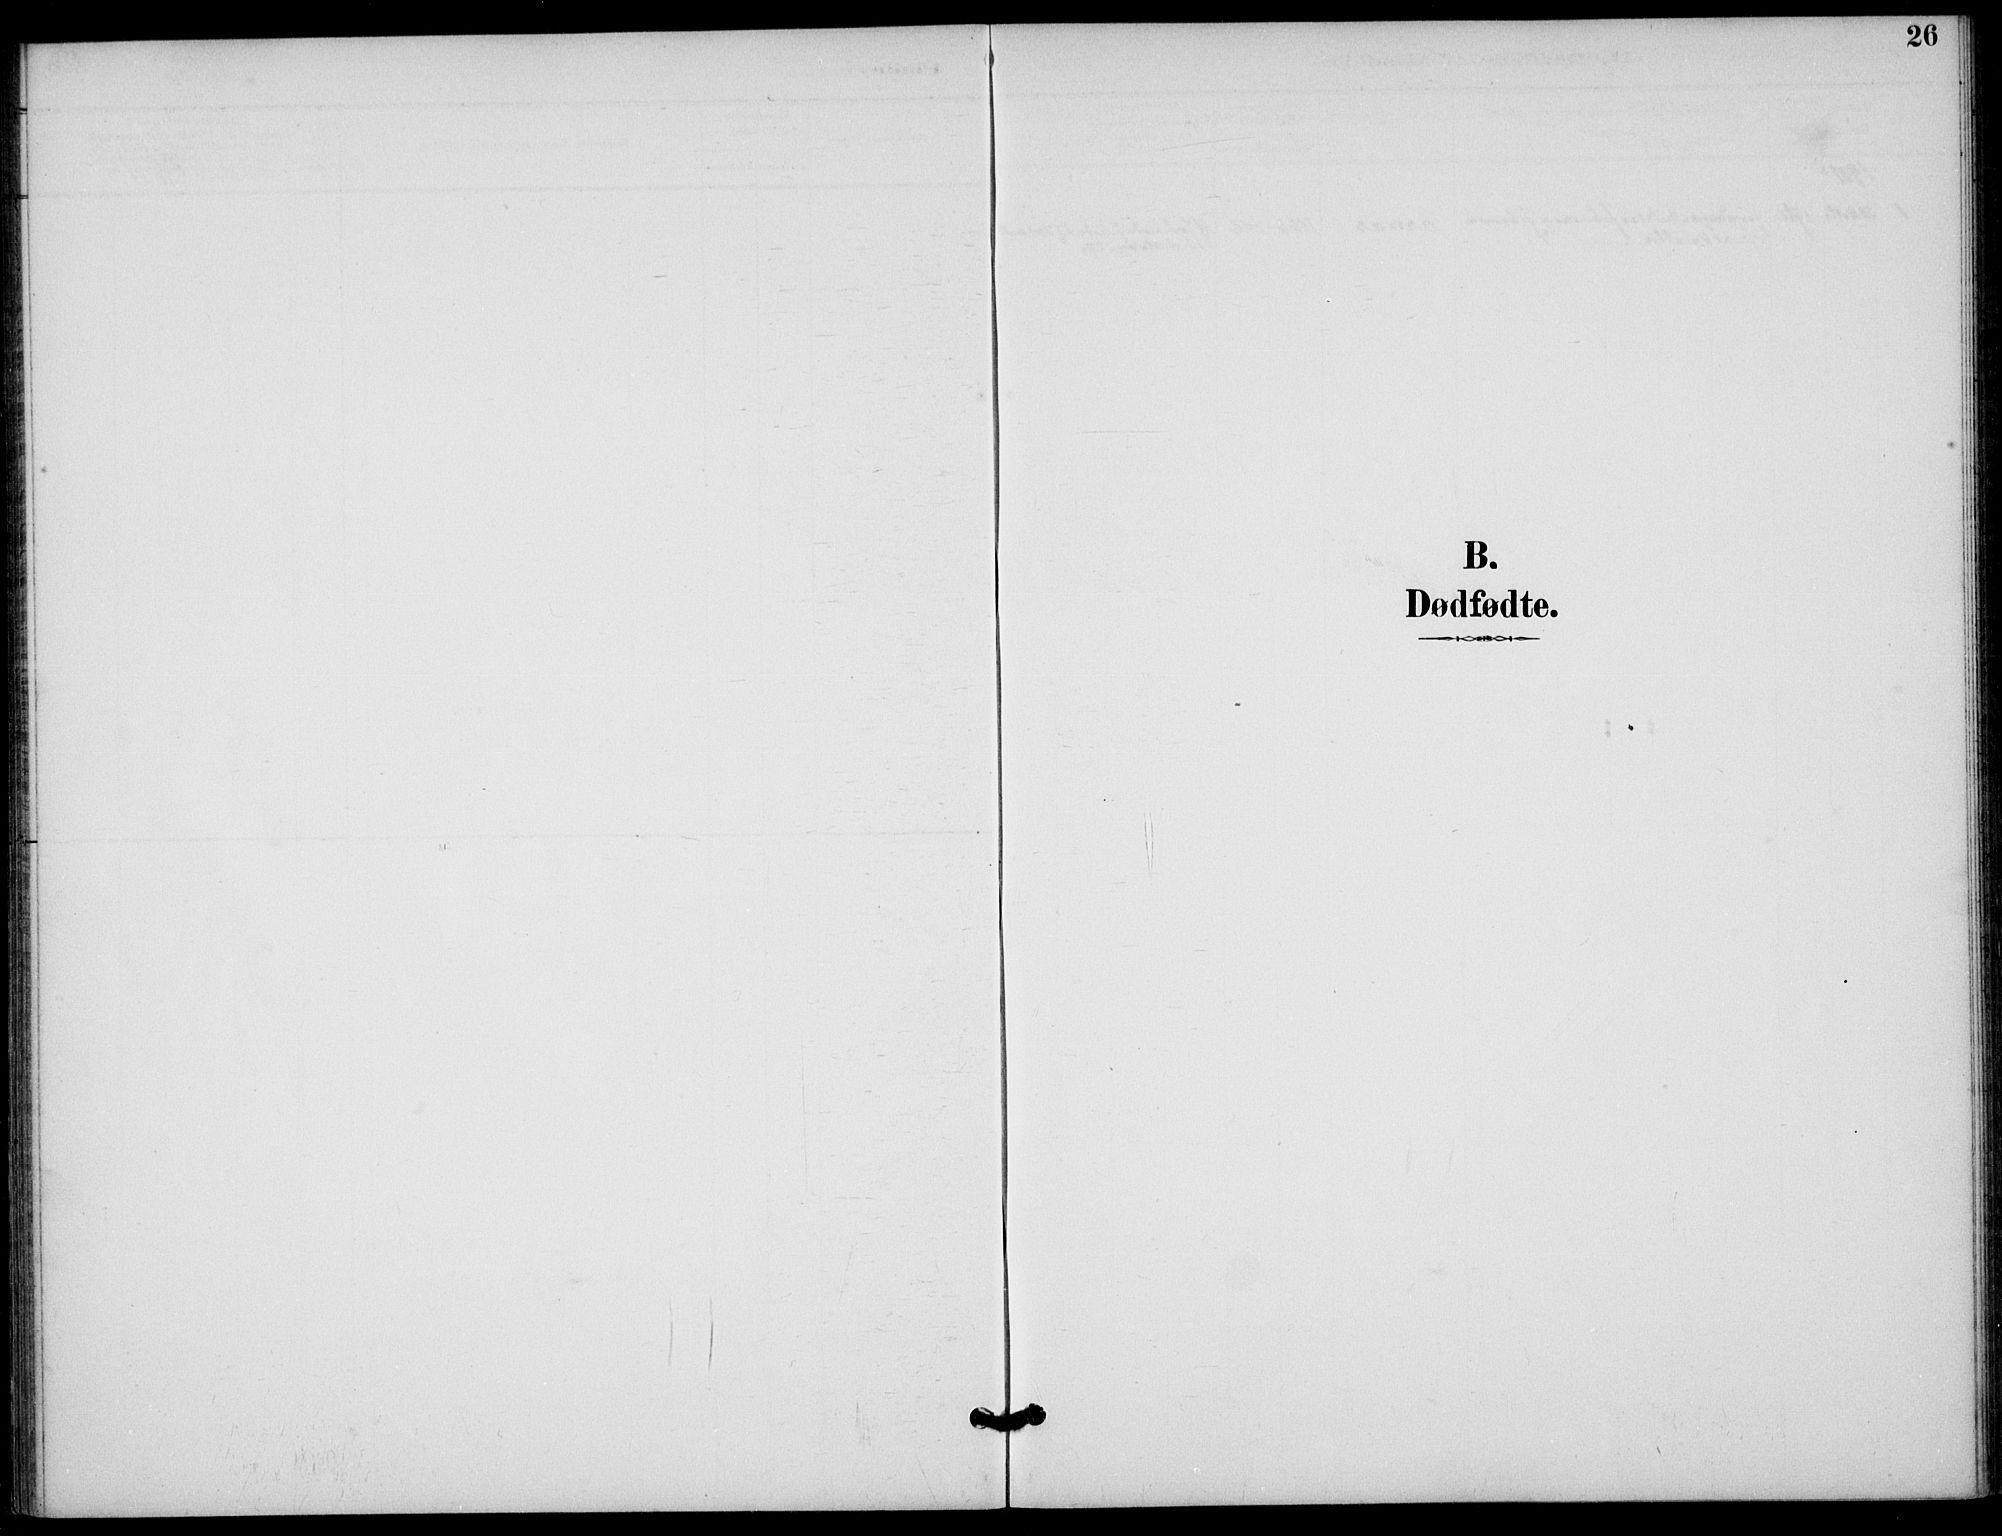 SAST, Finnøy sokneprestkontor, H/Ha/Haa/L0012: Ministerialbok nr. A 12, 1889-1917, s. 26